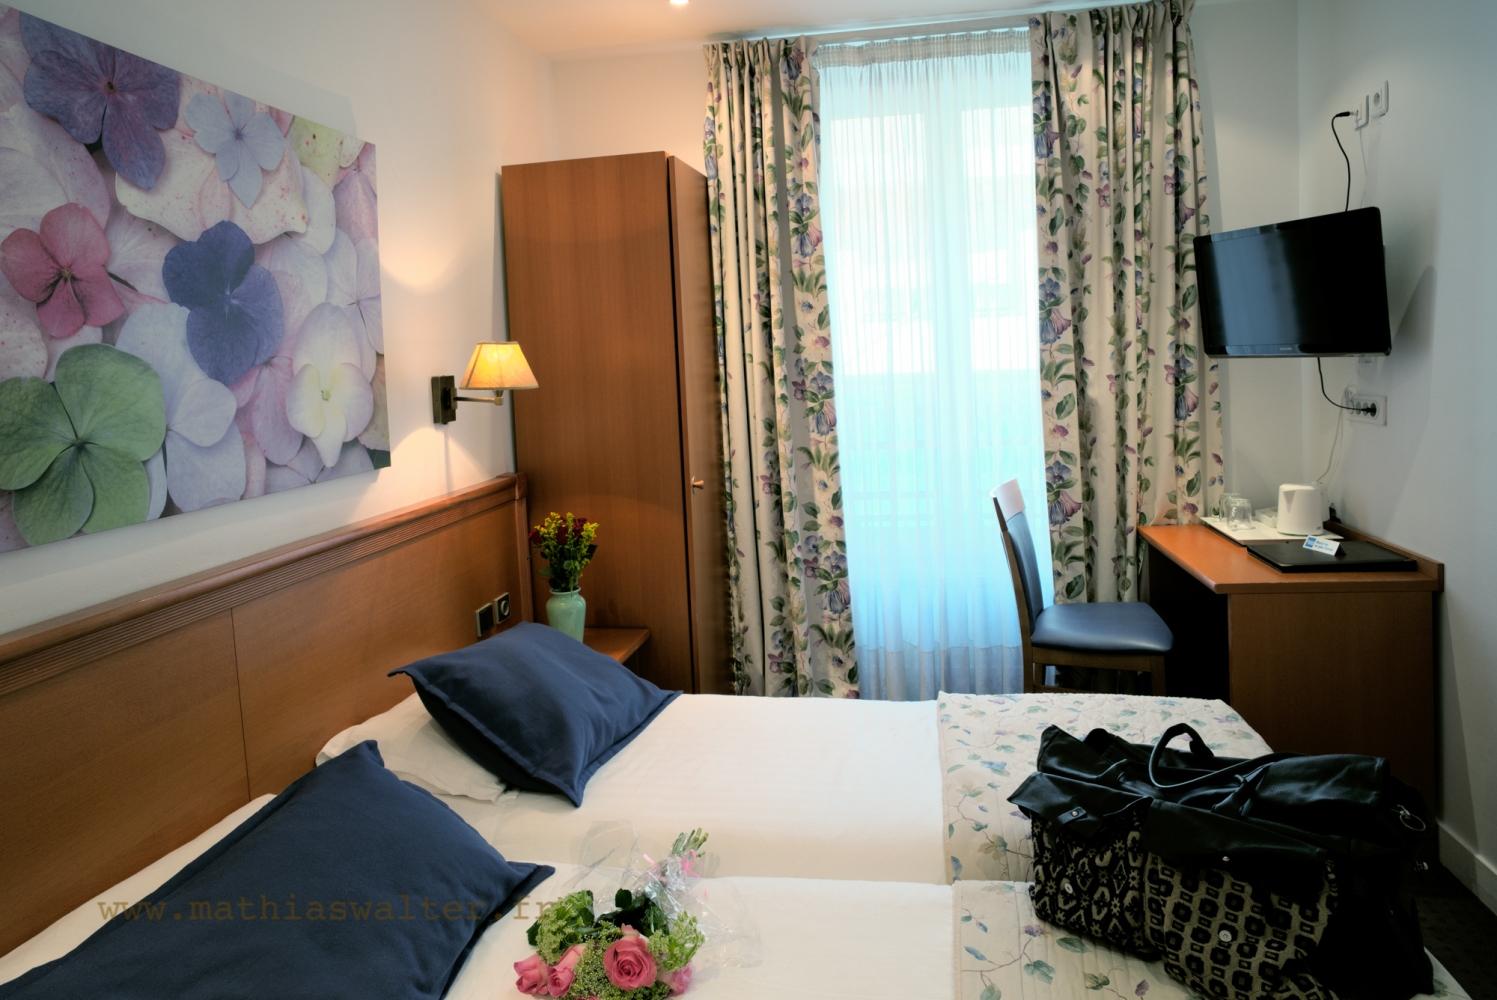 hotel pas cher dar faracha fes salle de reception pas cher ile de france elegant hotel in. Black Bedroom Furniture Sets. Home Design Ideas